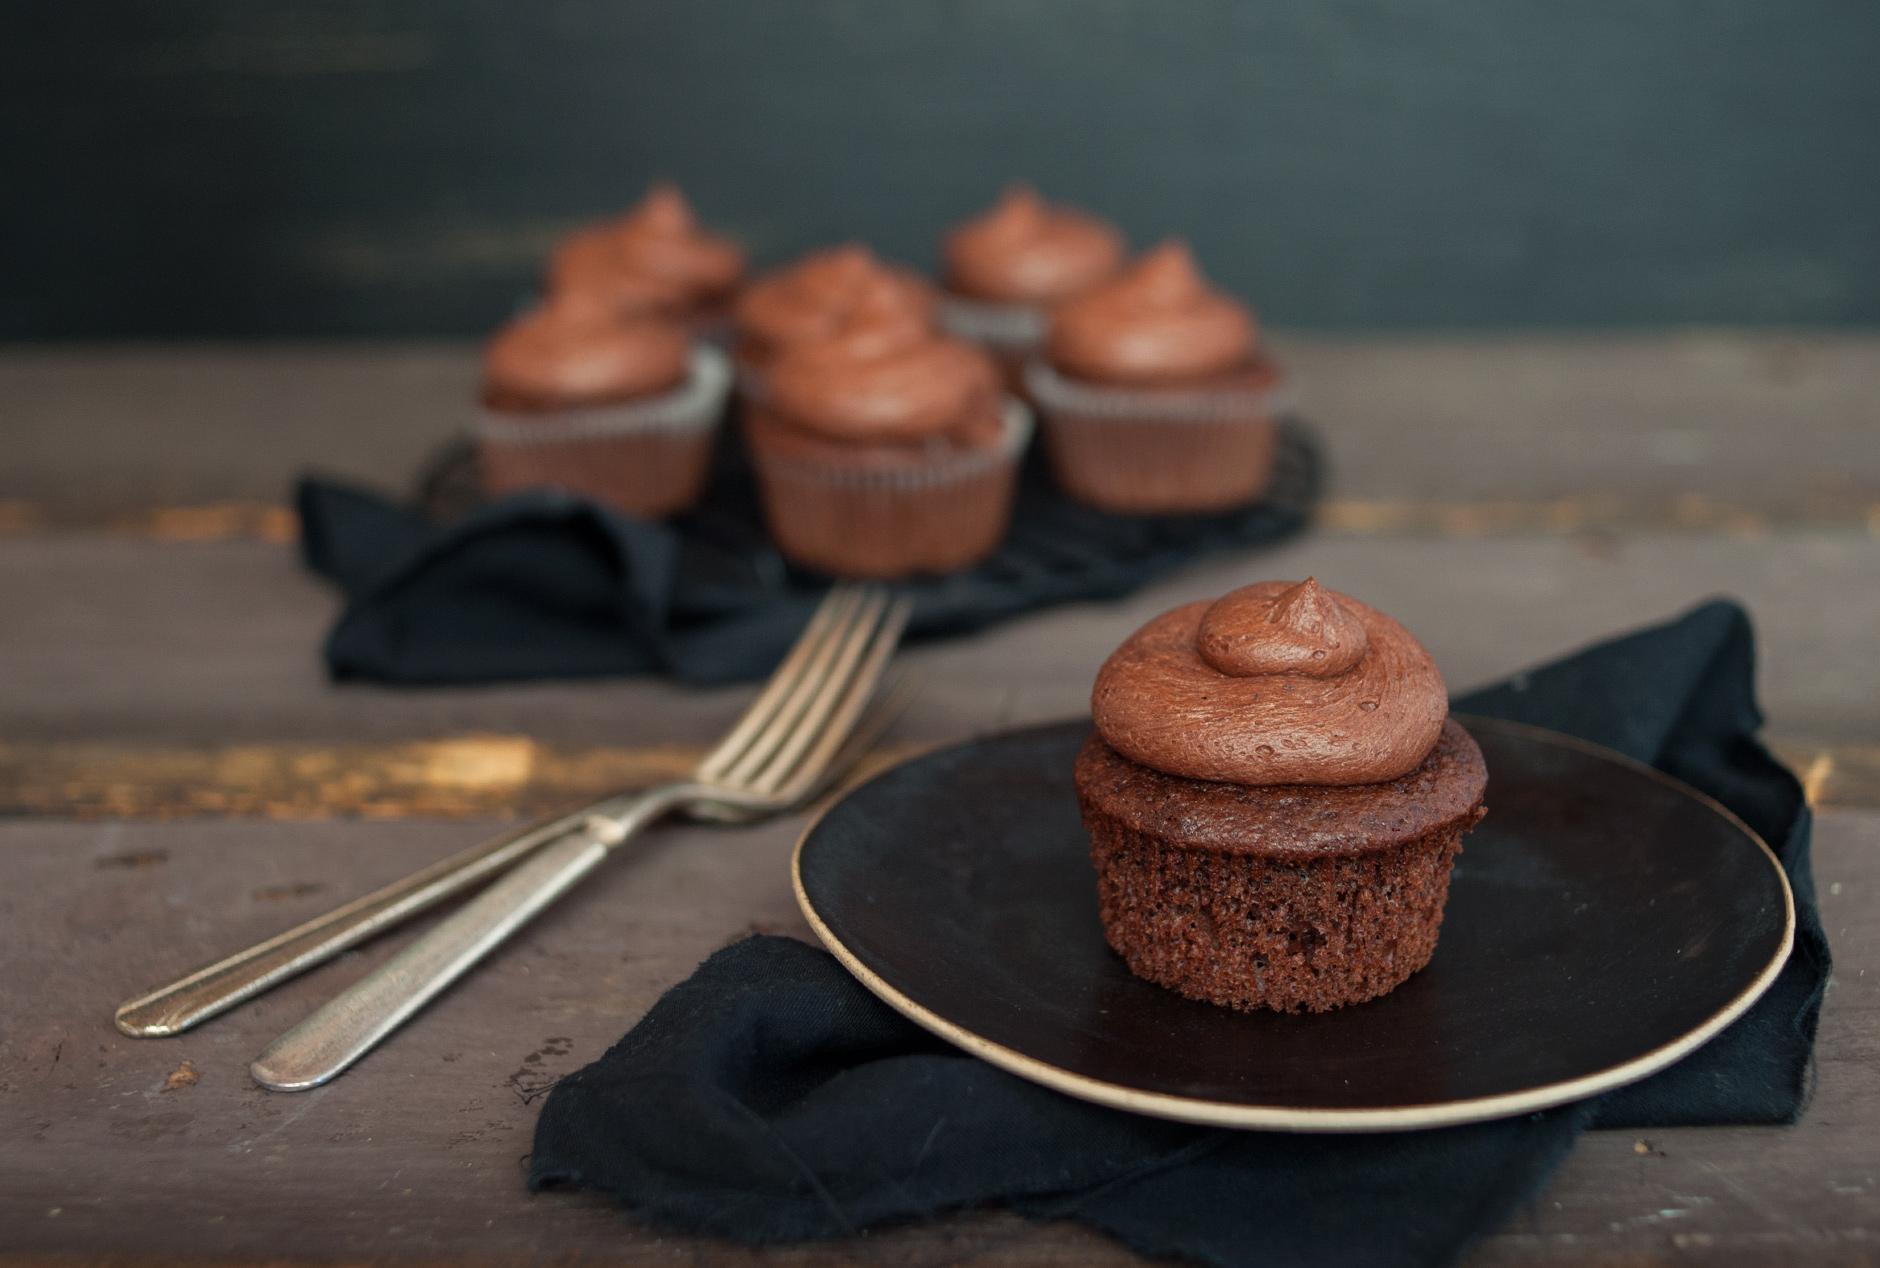 ChocolateCupcakes_food_photography_1.jpg